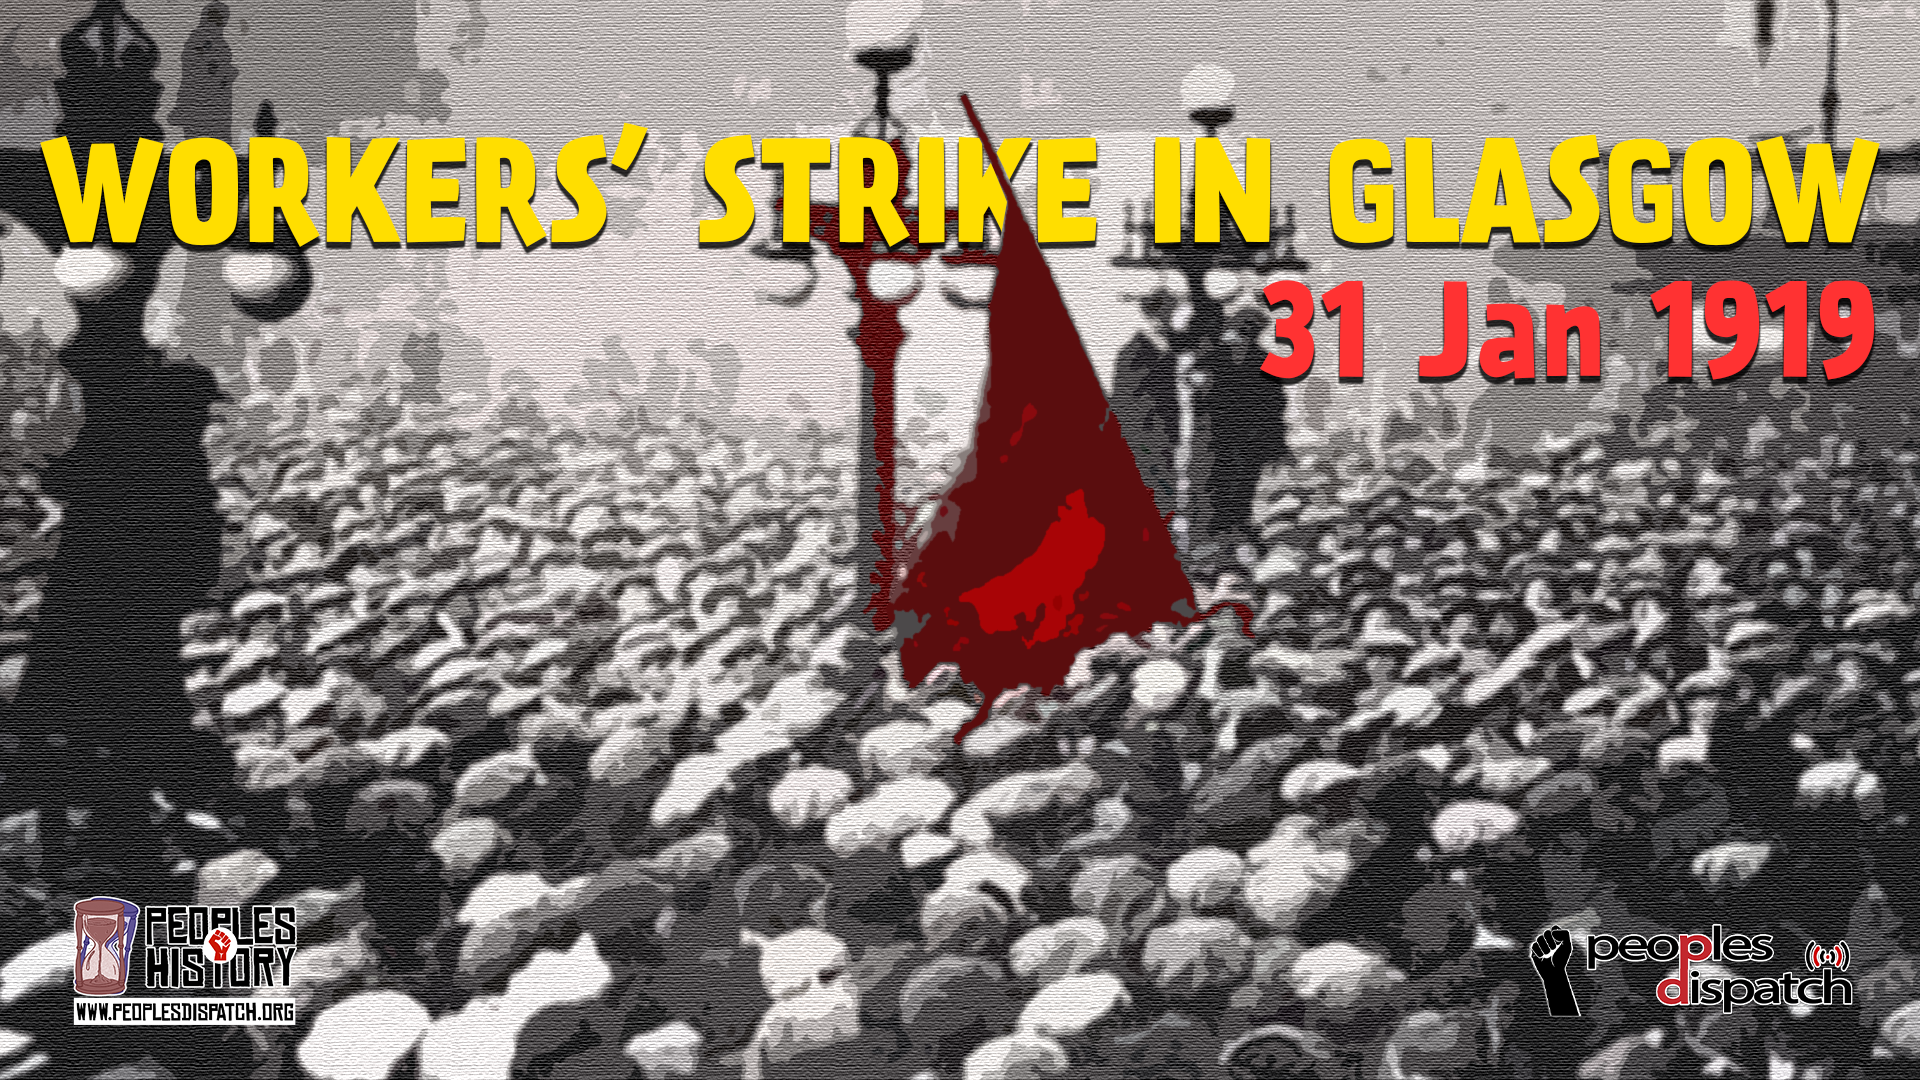 Workers strike in Glasgow 1919